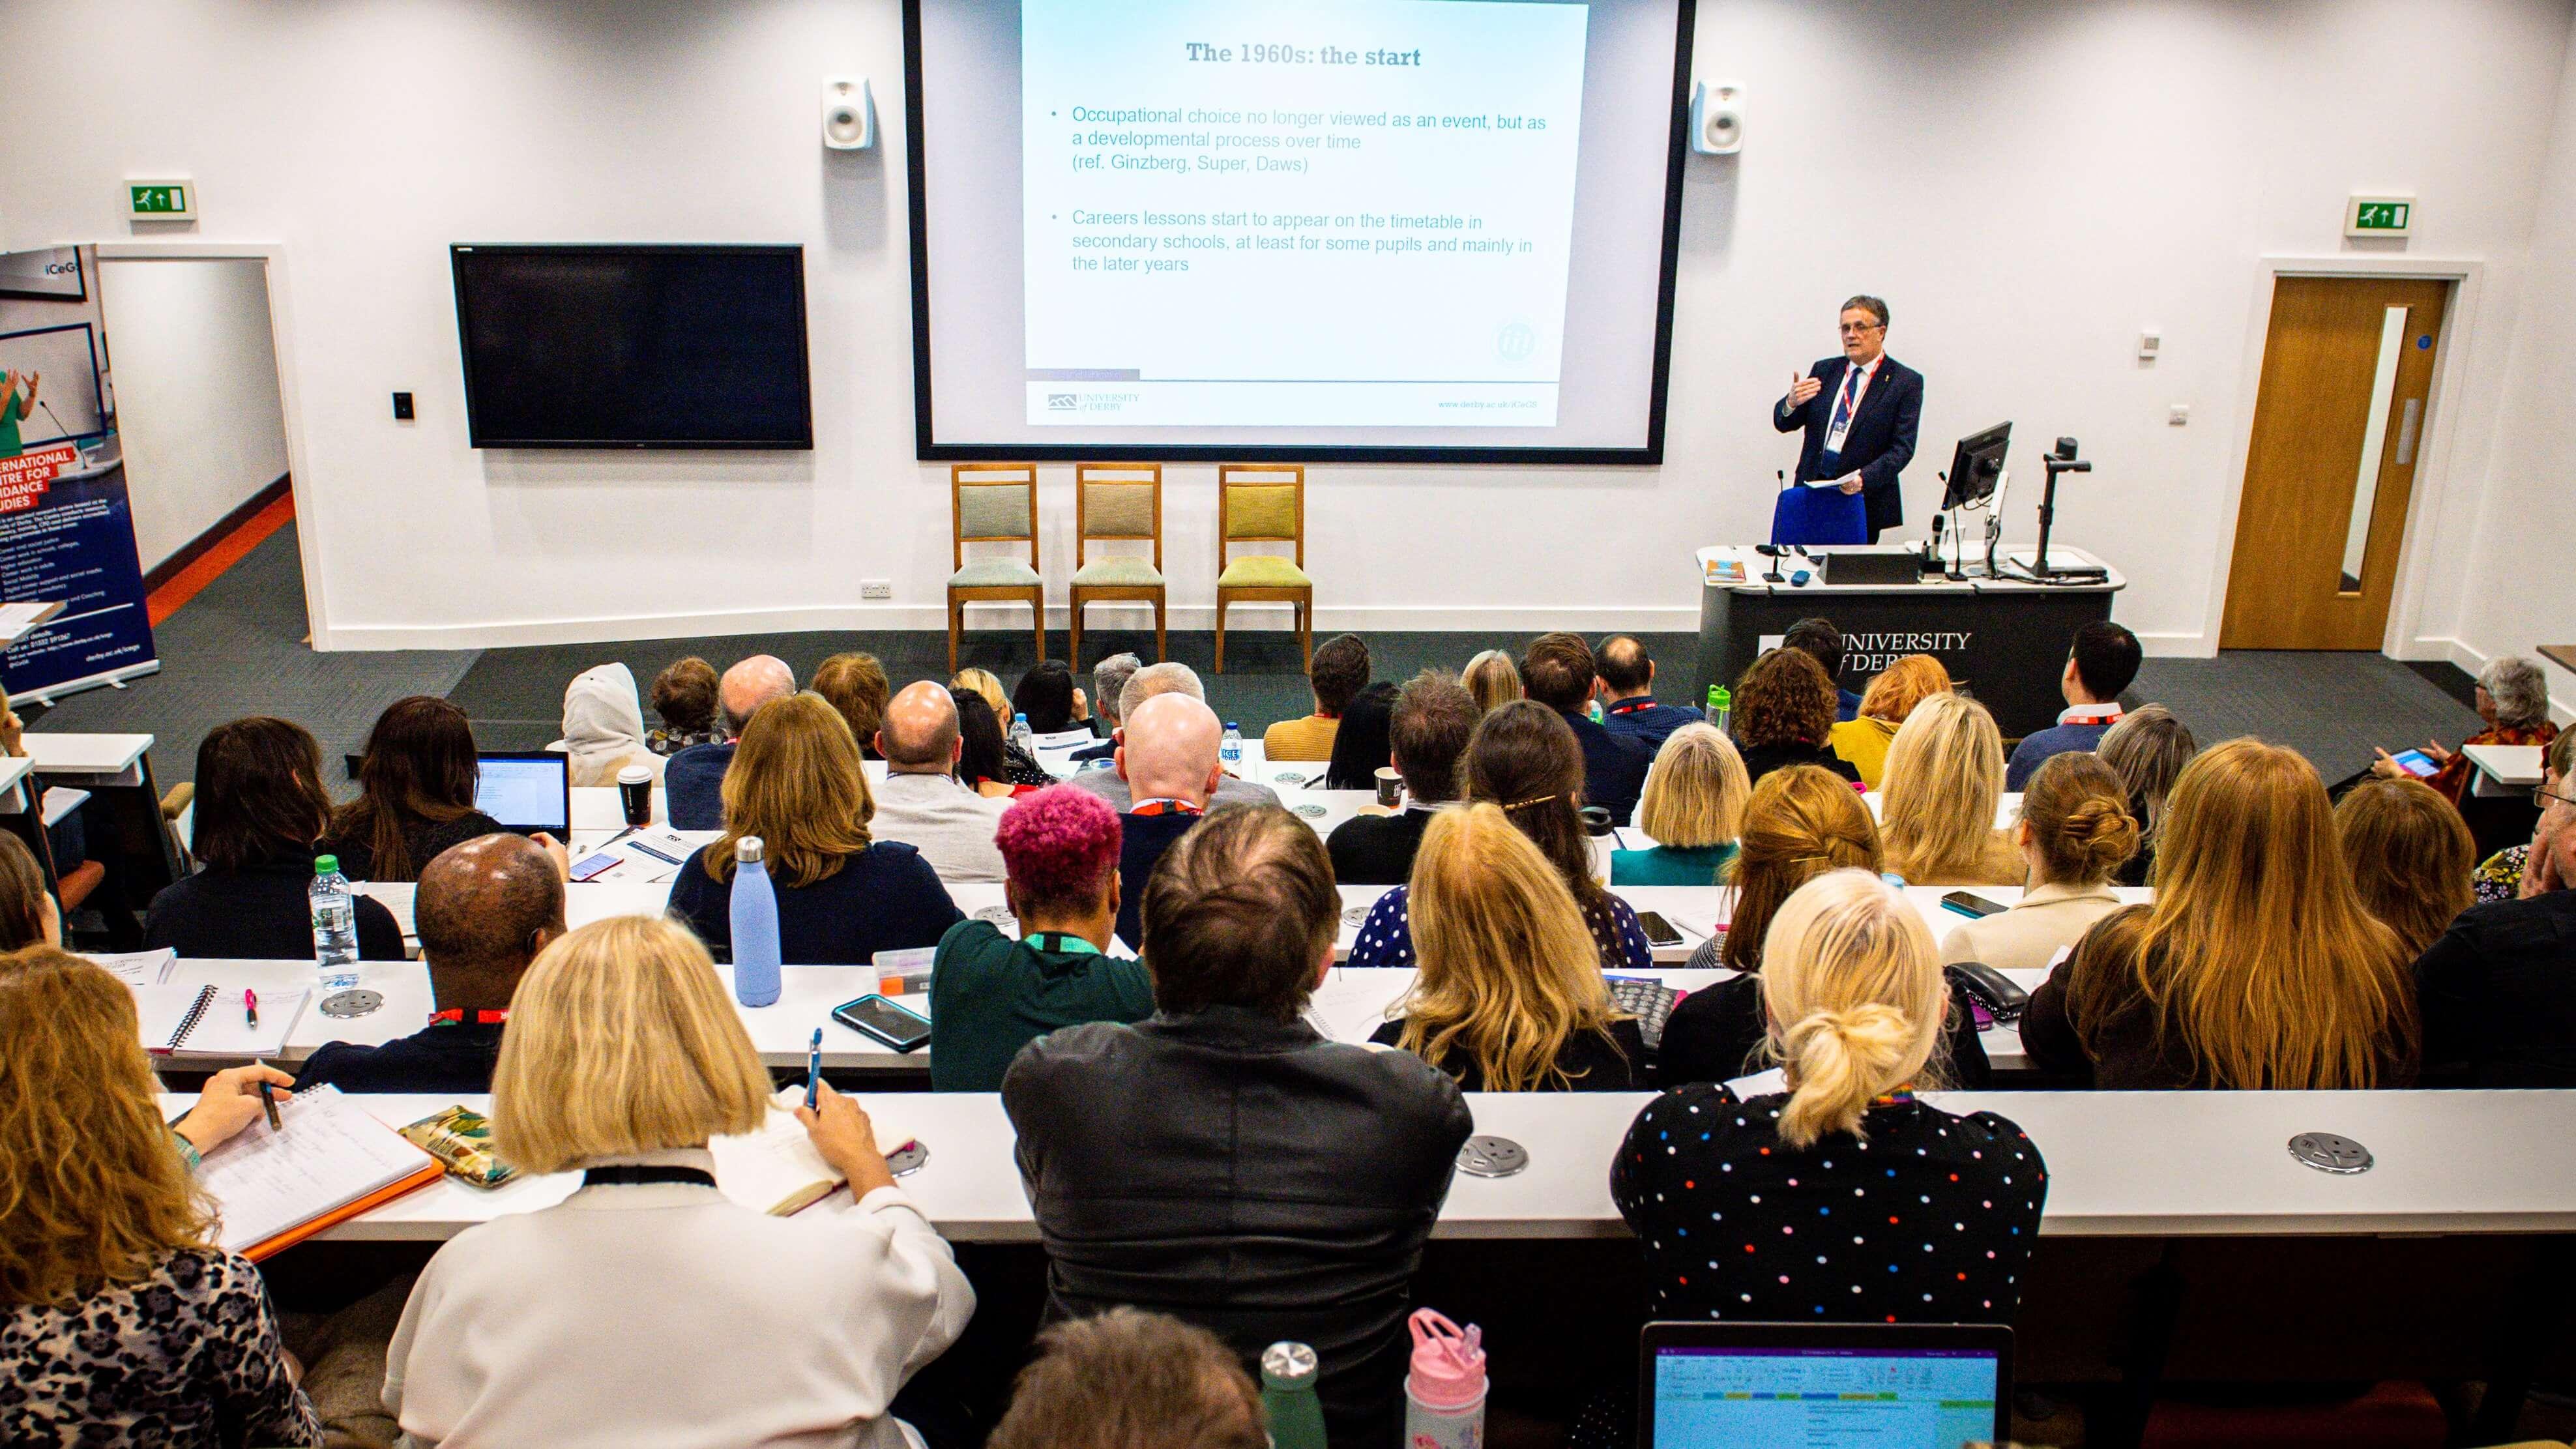 David Andrews Presenting at Annual Lecture 2019